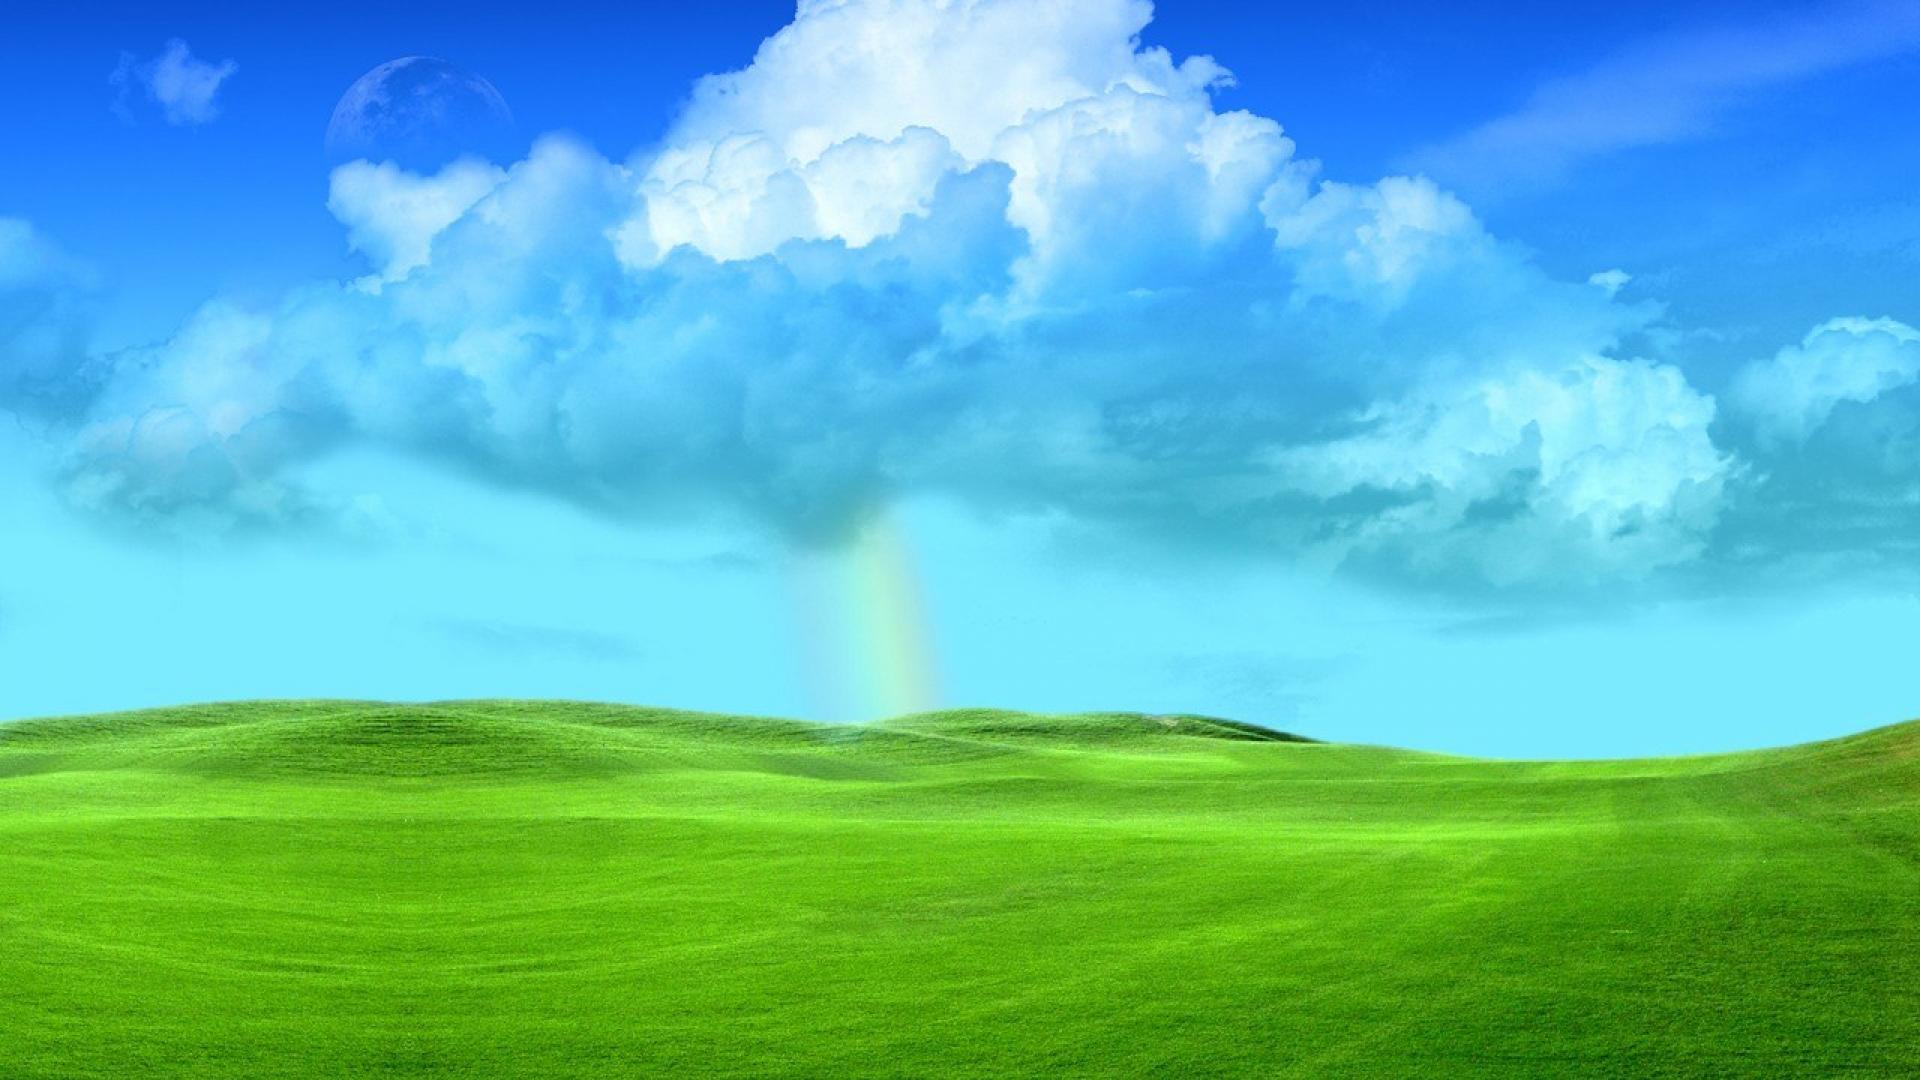 Sky Grass Wallpapers Free : Other Wallpaper - Petsprin